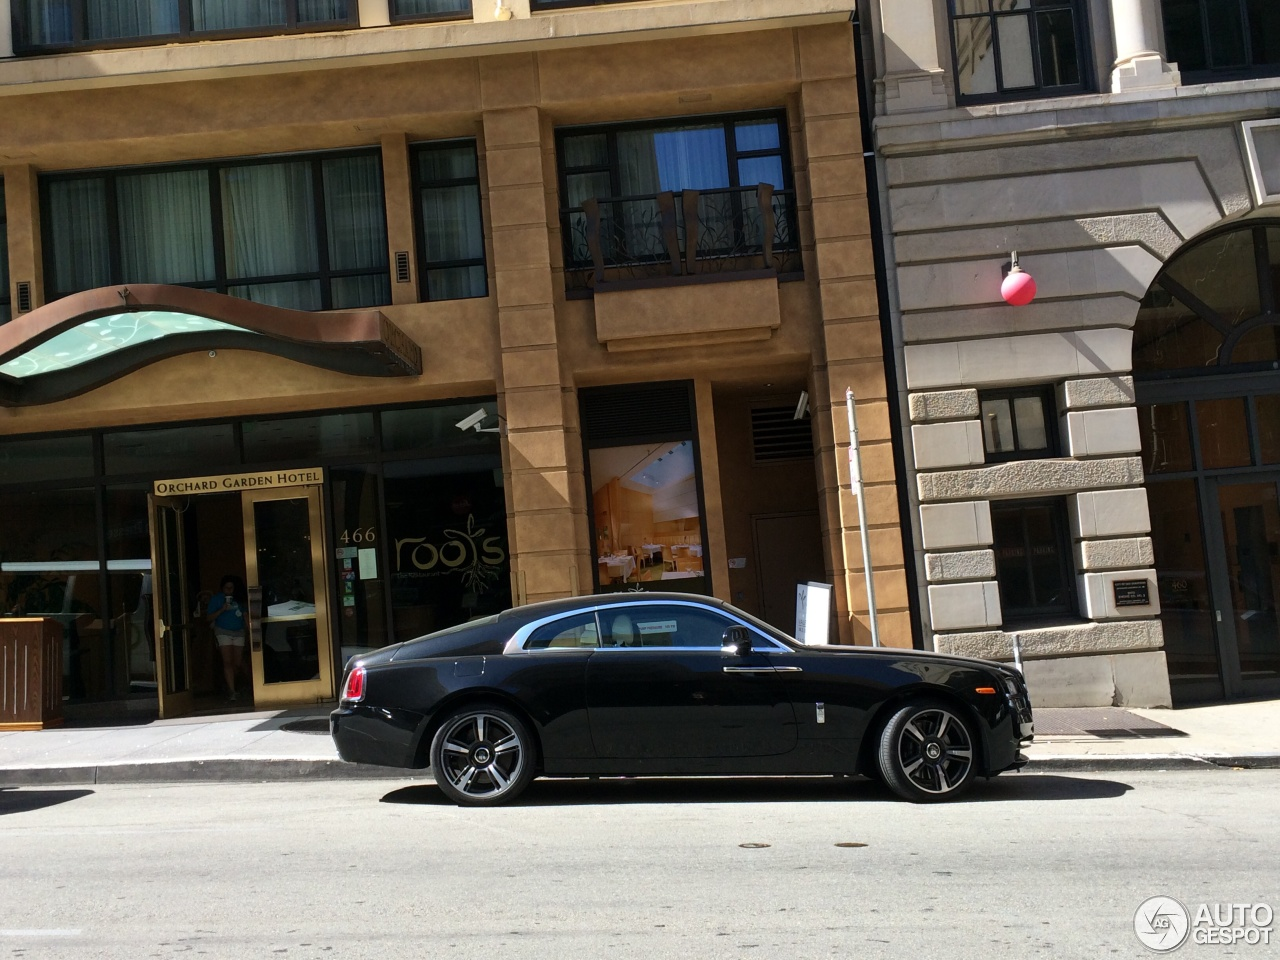 Rolls-Royce Wraith - 6 April 2015 - Autogespot